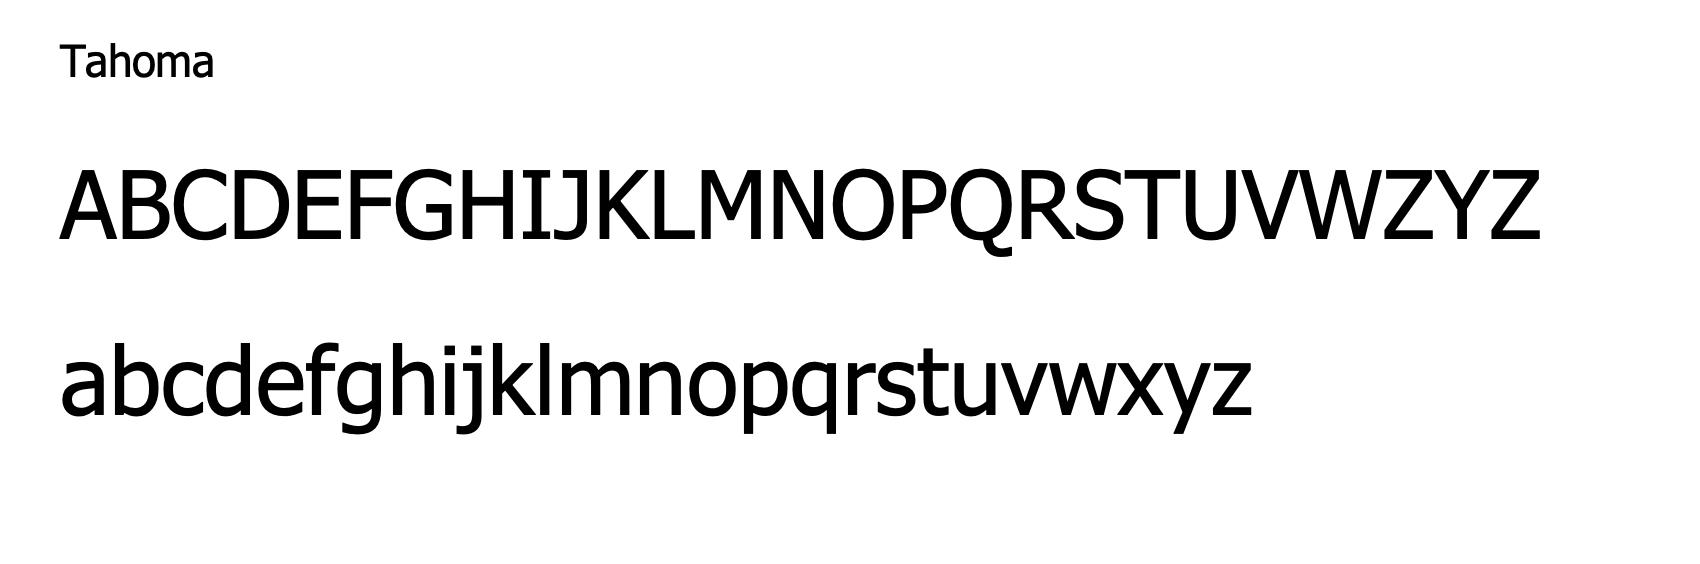 Tahoma - web safe email signature font